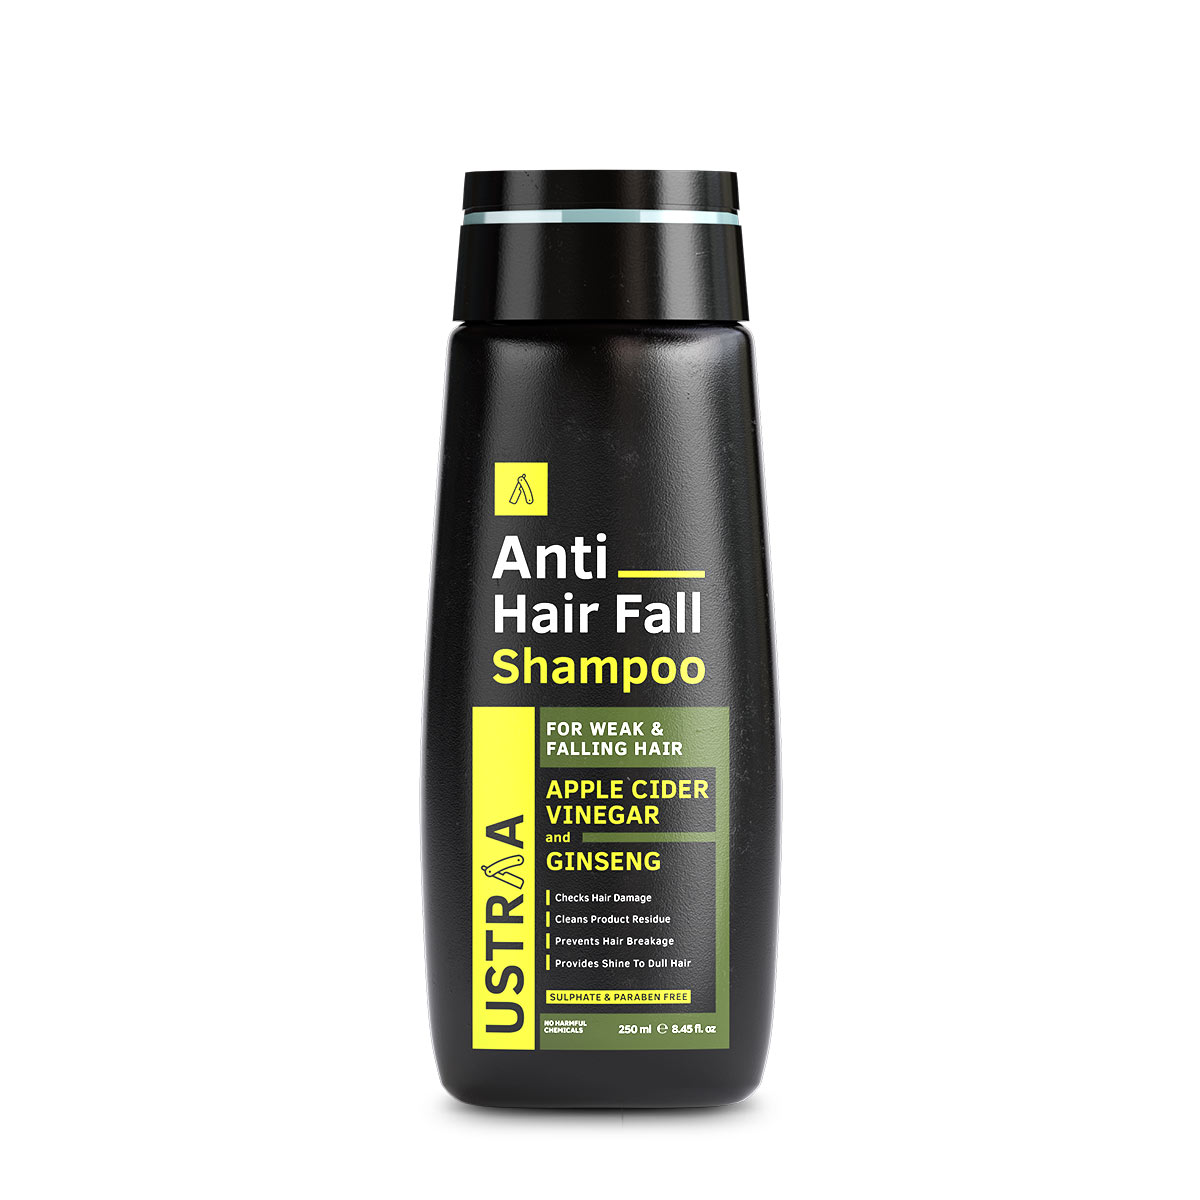 Ustraa | Ustraa Anti Hair Fall with Apple Cider Vinegar Shampoo, 250ml